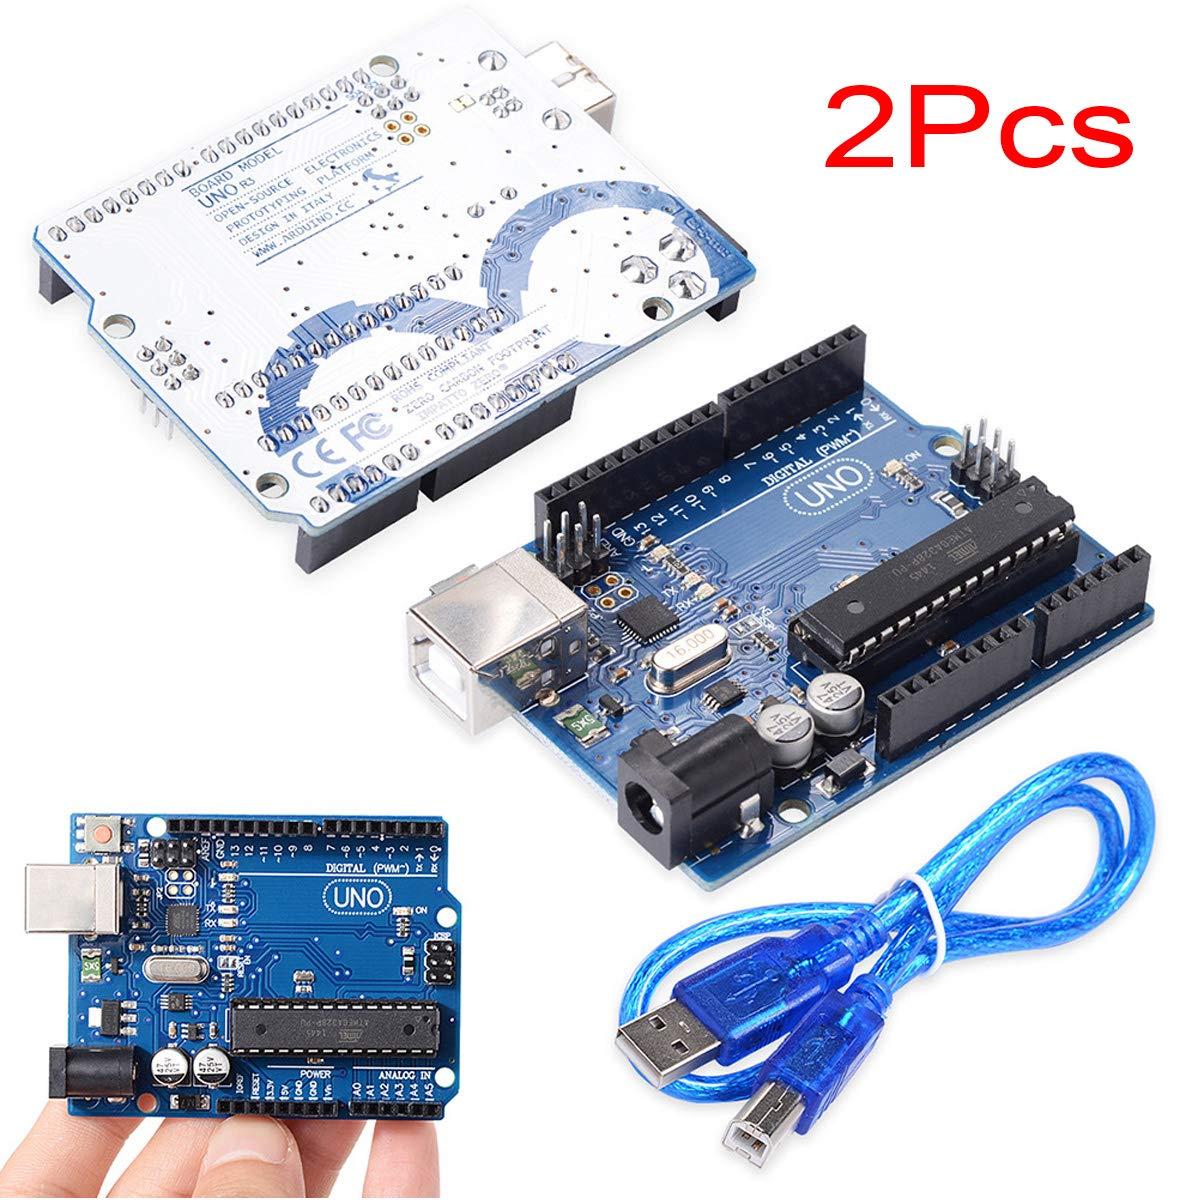 Clavija de Cabezal 7E TRADING 2 Unids UNO R3 ATmega328P Placa de Desarrollo CH340 Compatible Arduino IDE Pin Recto UNO R3 ATmega328P con Cable USB para Arduino